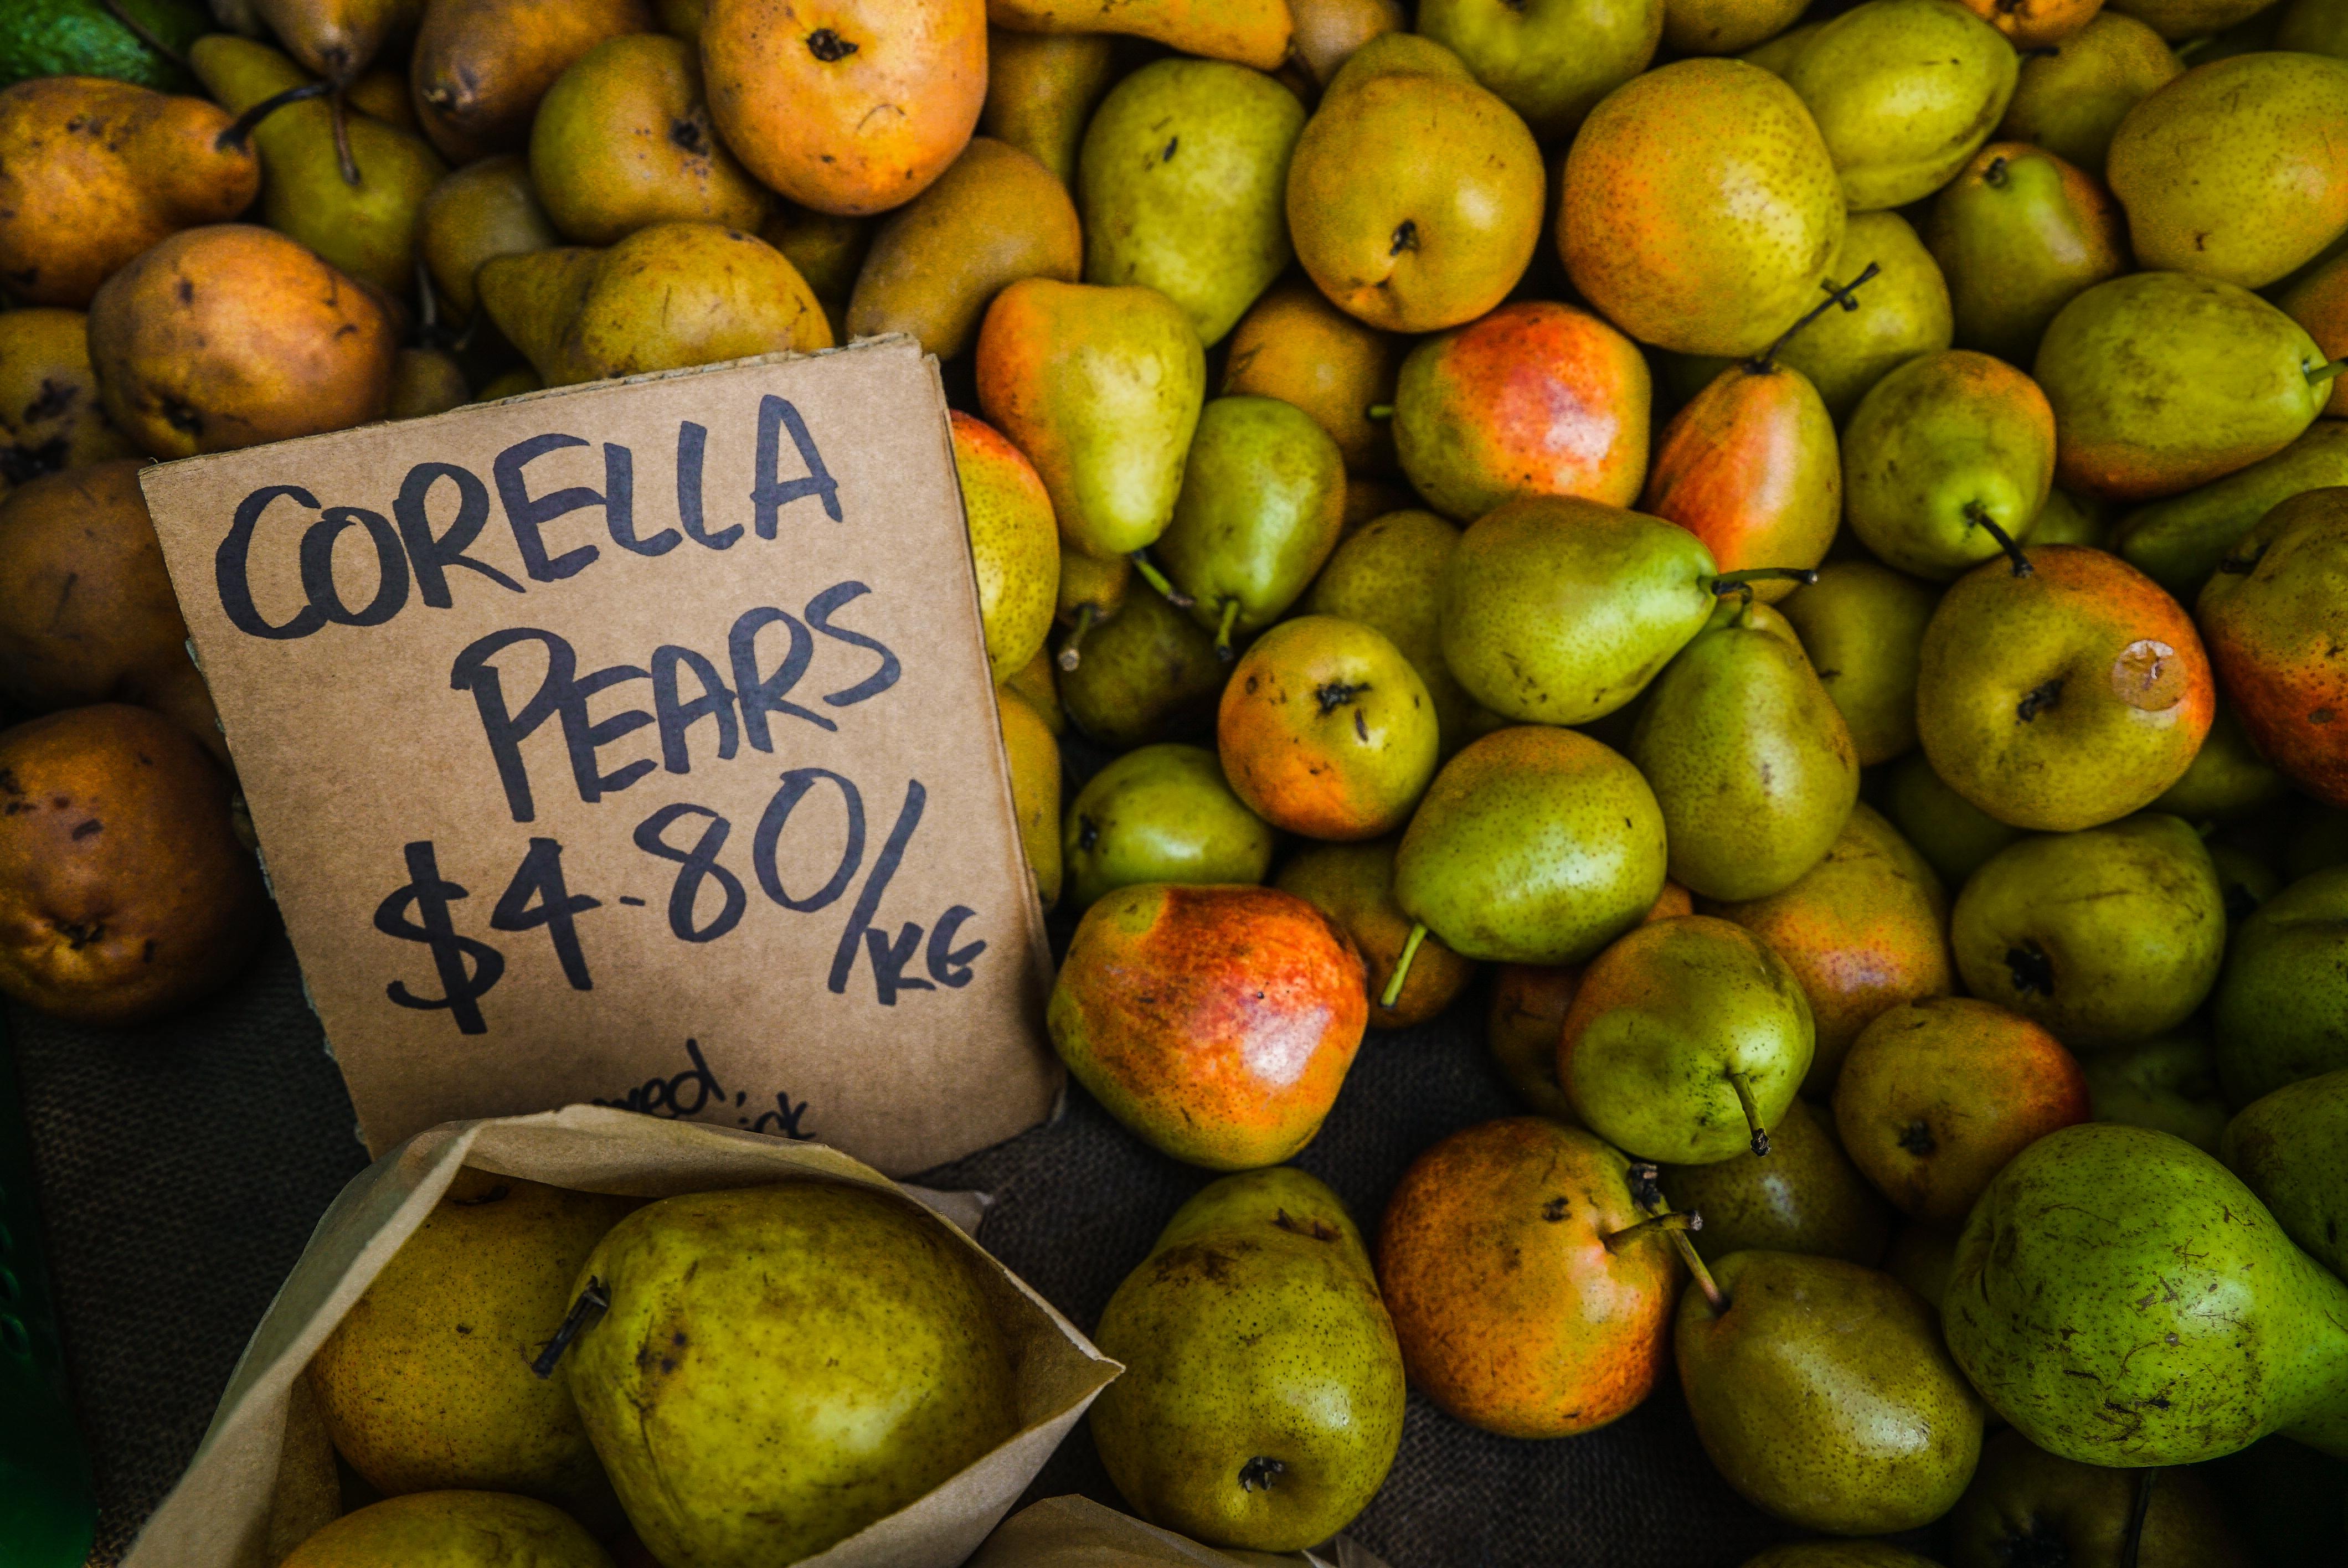 Green-and-orange Corella Pear Fruit Lot